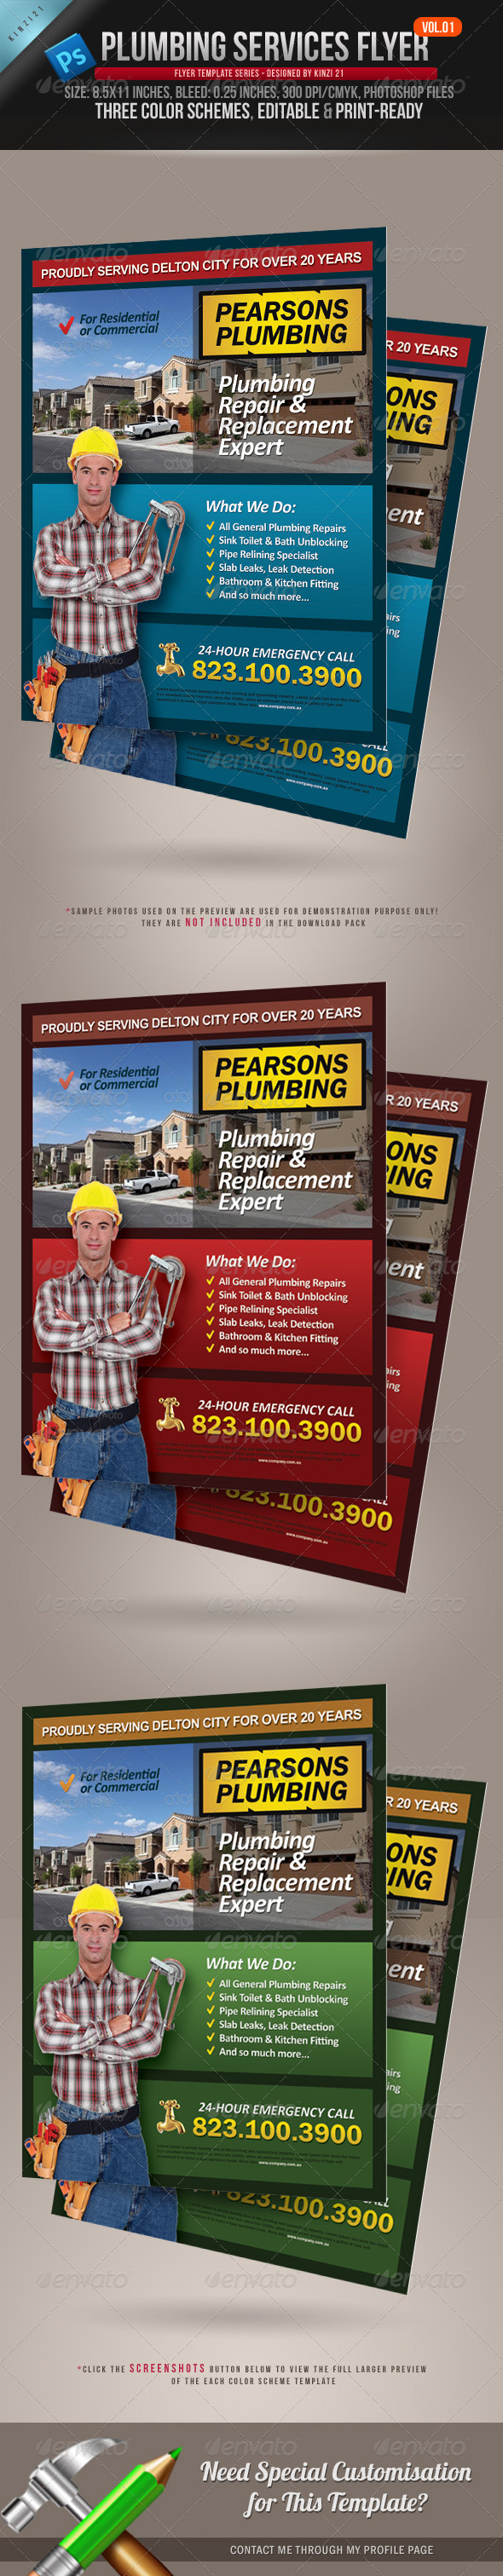 Plumbing Services Flyer Vol.01 - Corporate Flyers